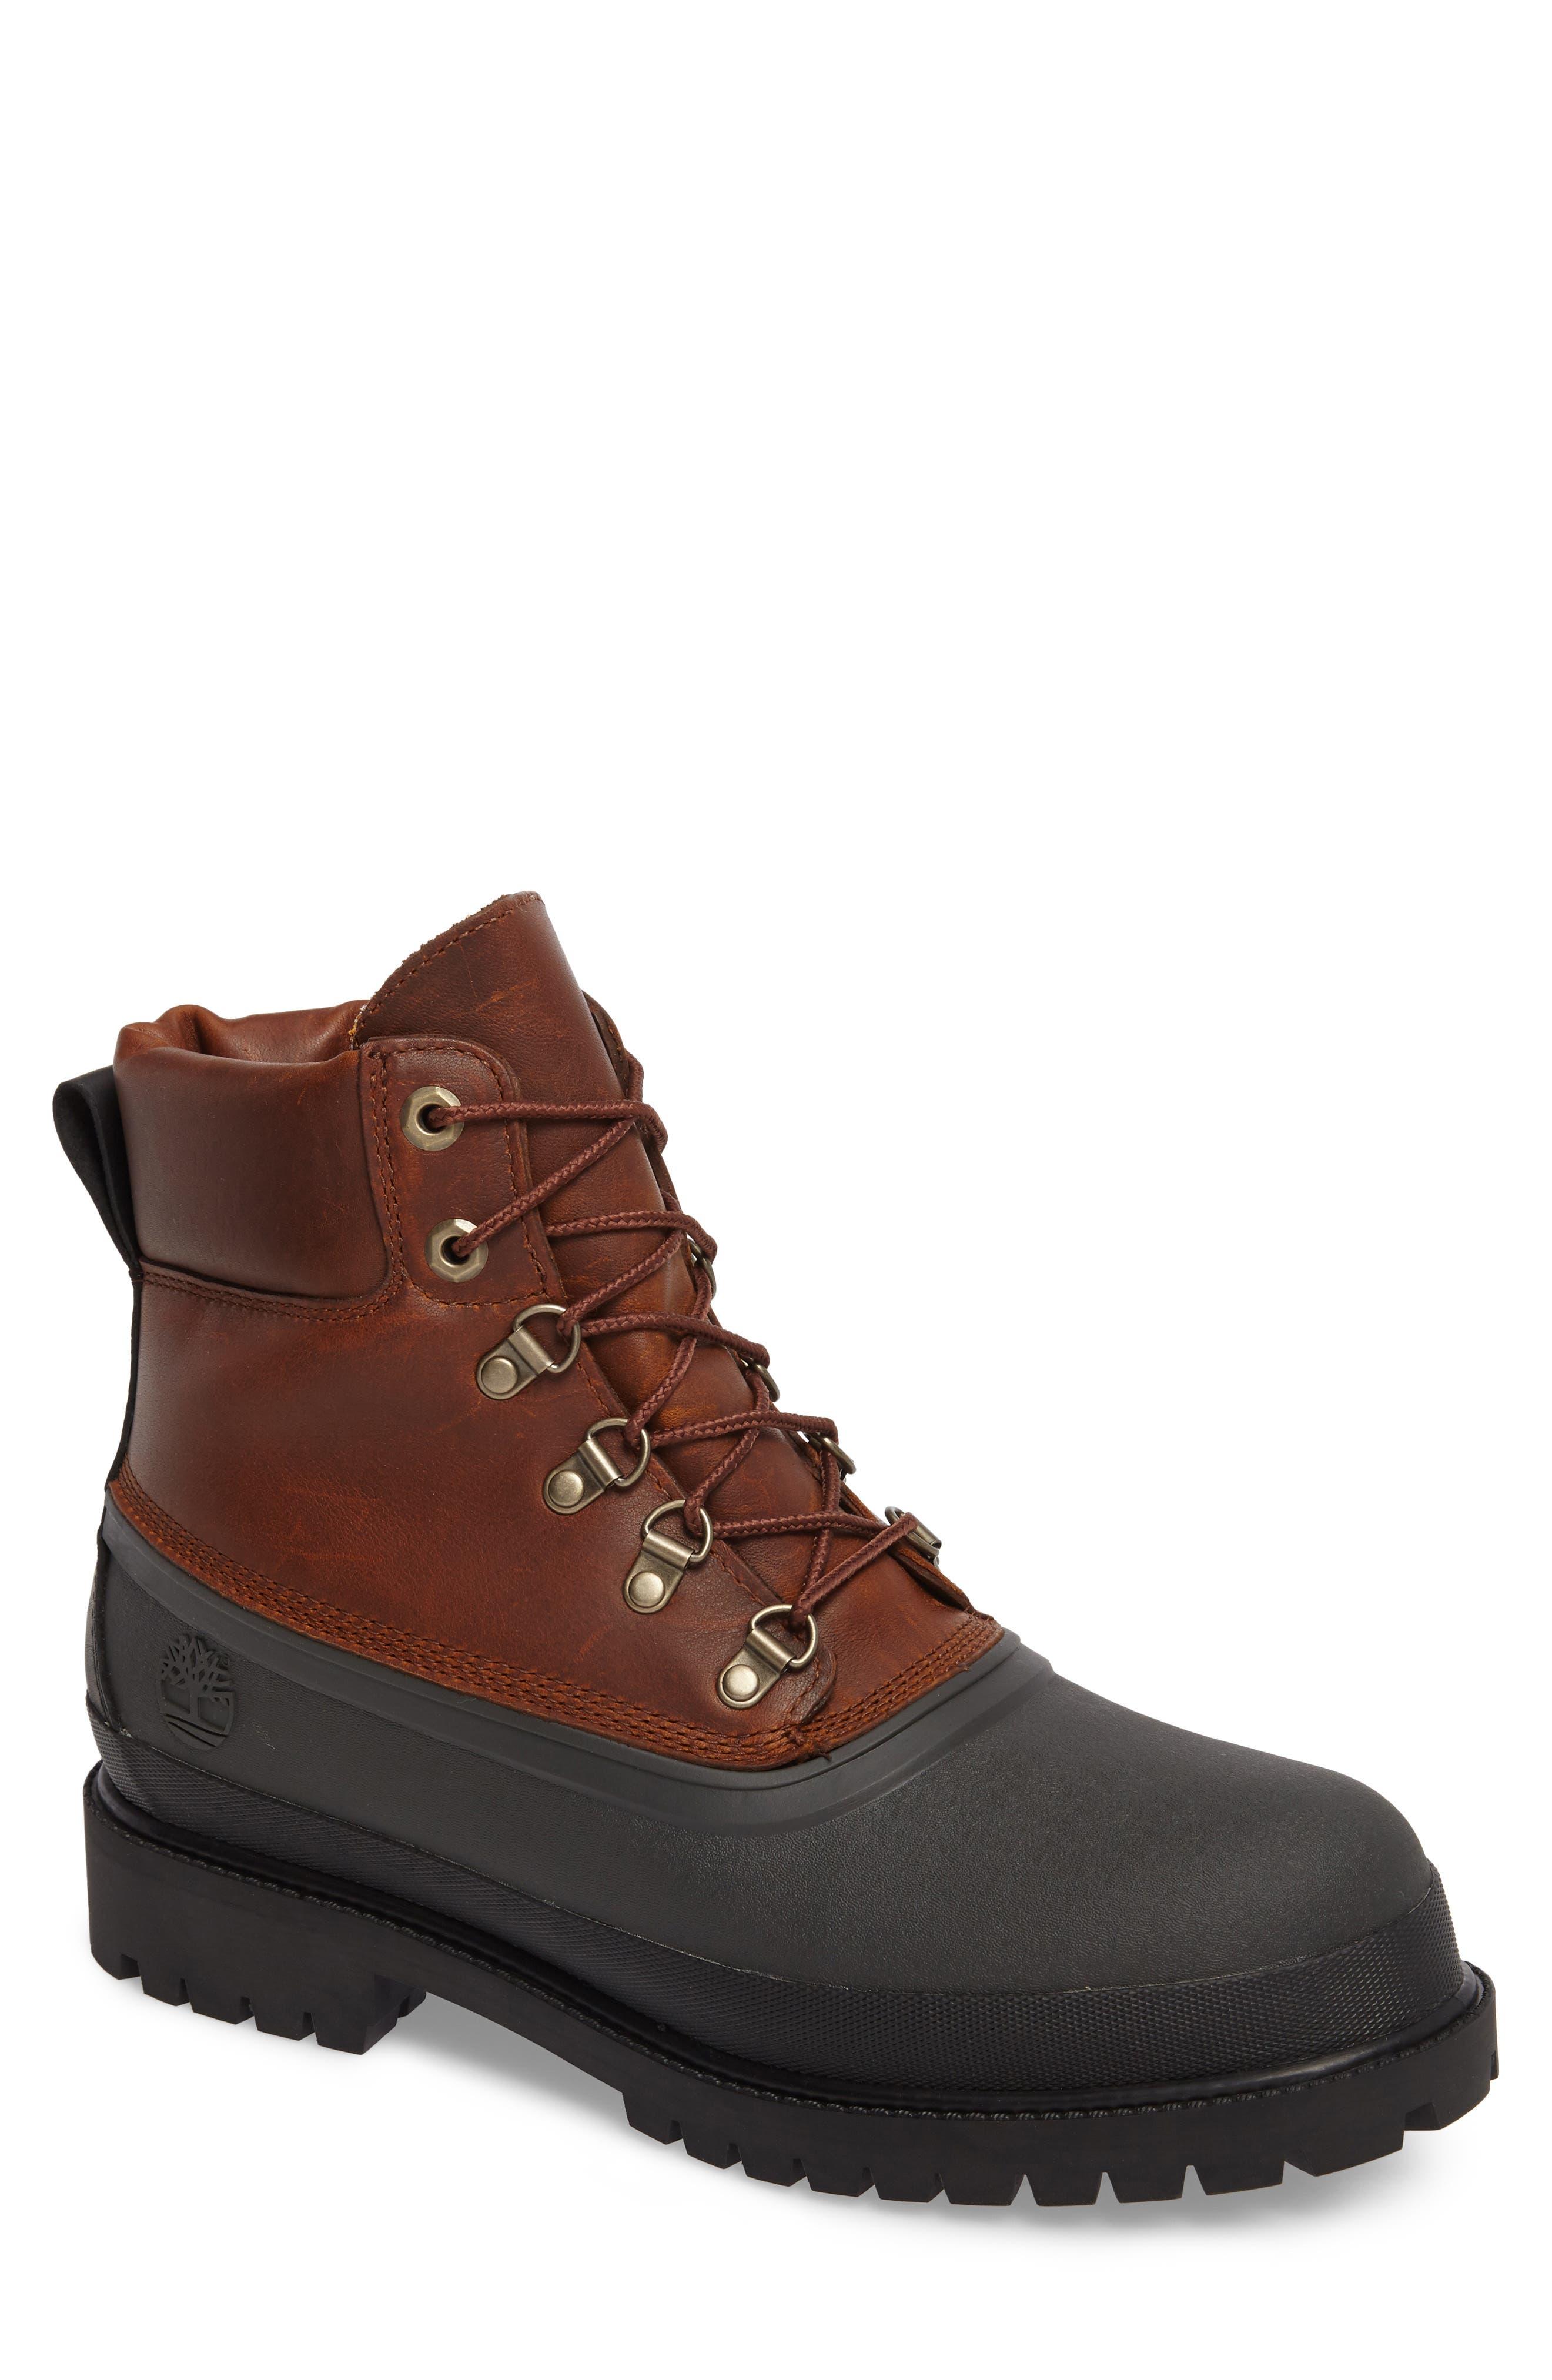 Alternate Image 1 Selected - Timberland Snow Boot (Men)